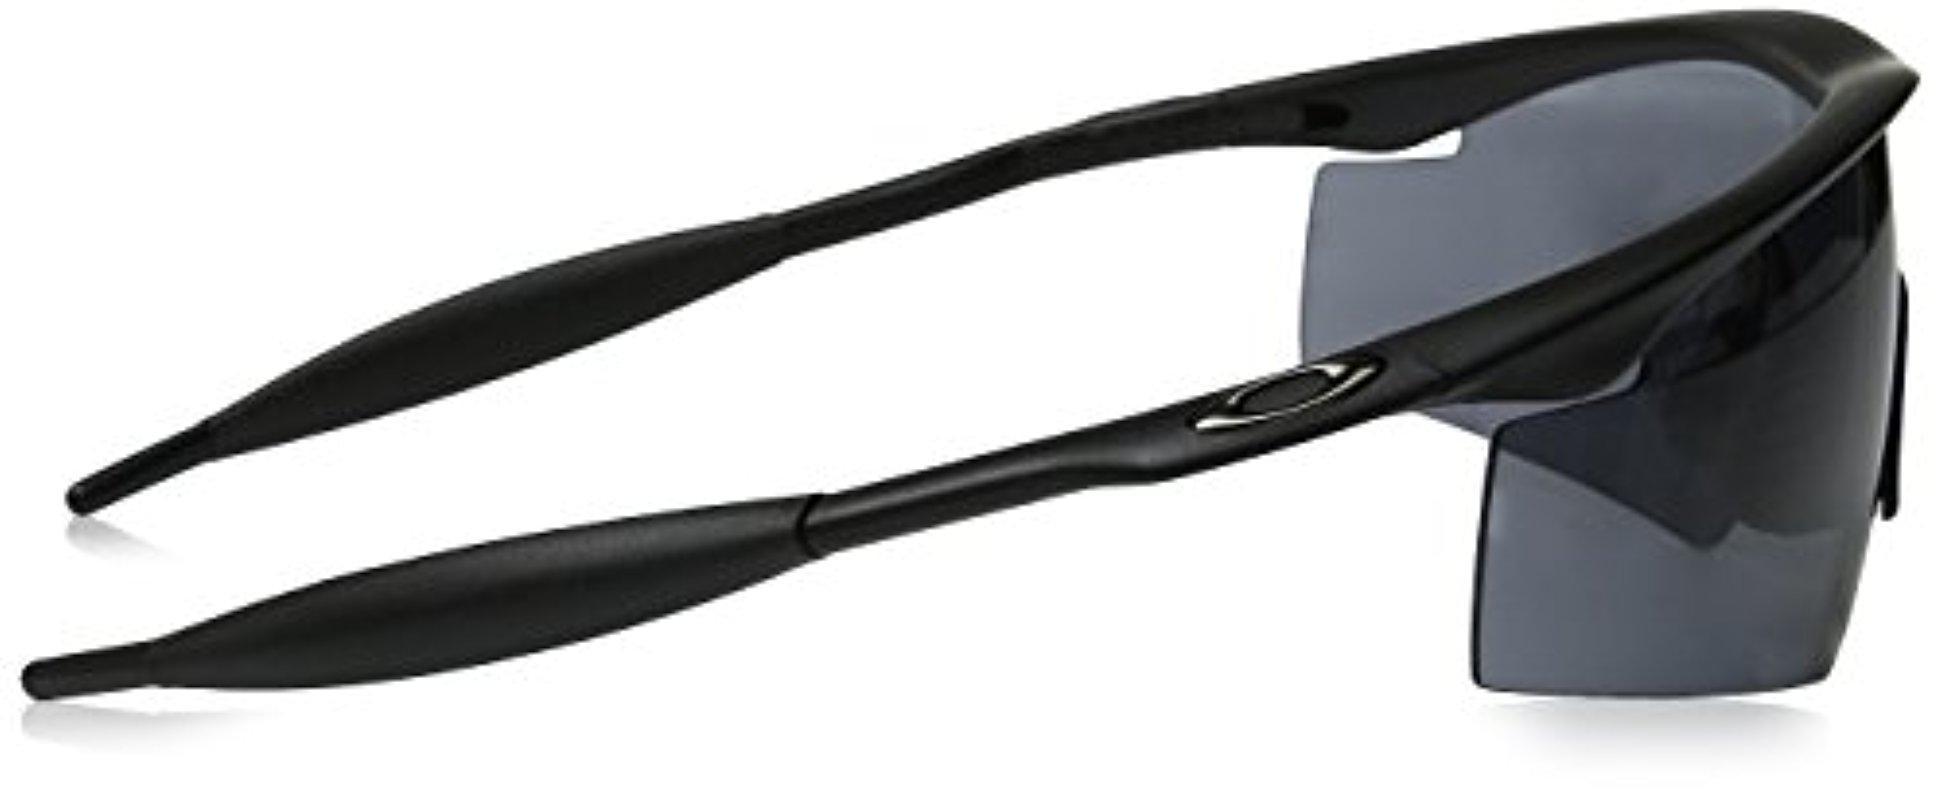 Lyst - Oakley Oo9060 Ballistic M Frame Sunglasses 34mm in Black for Men